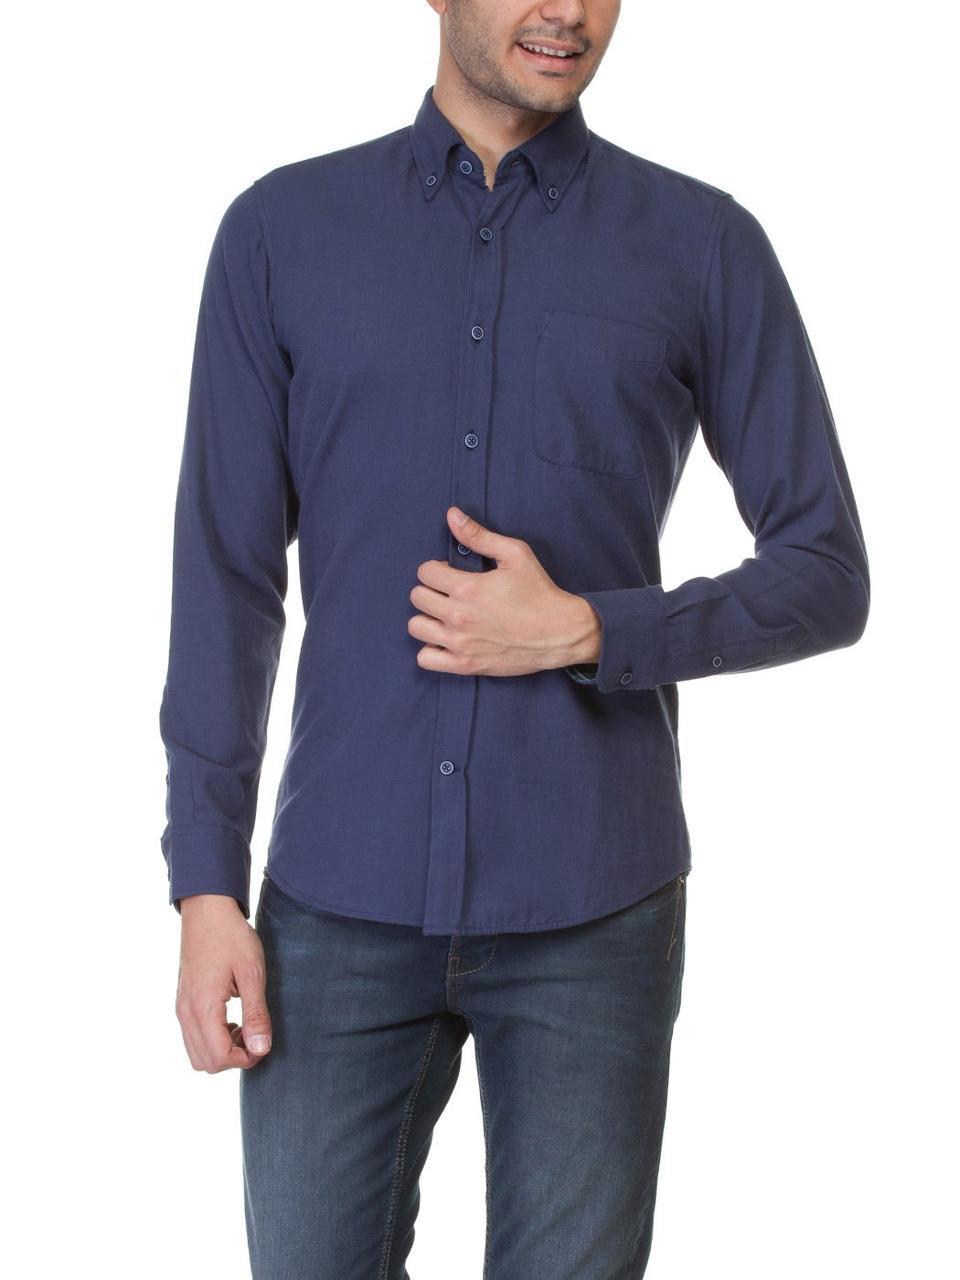 Синяя мужская рубашка LC Waikiki / ЛС Вайкики с синими пуговицами